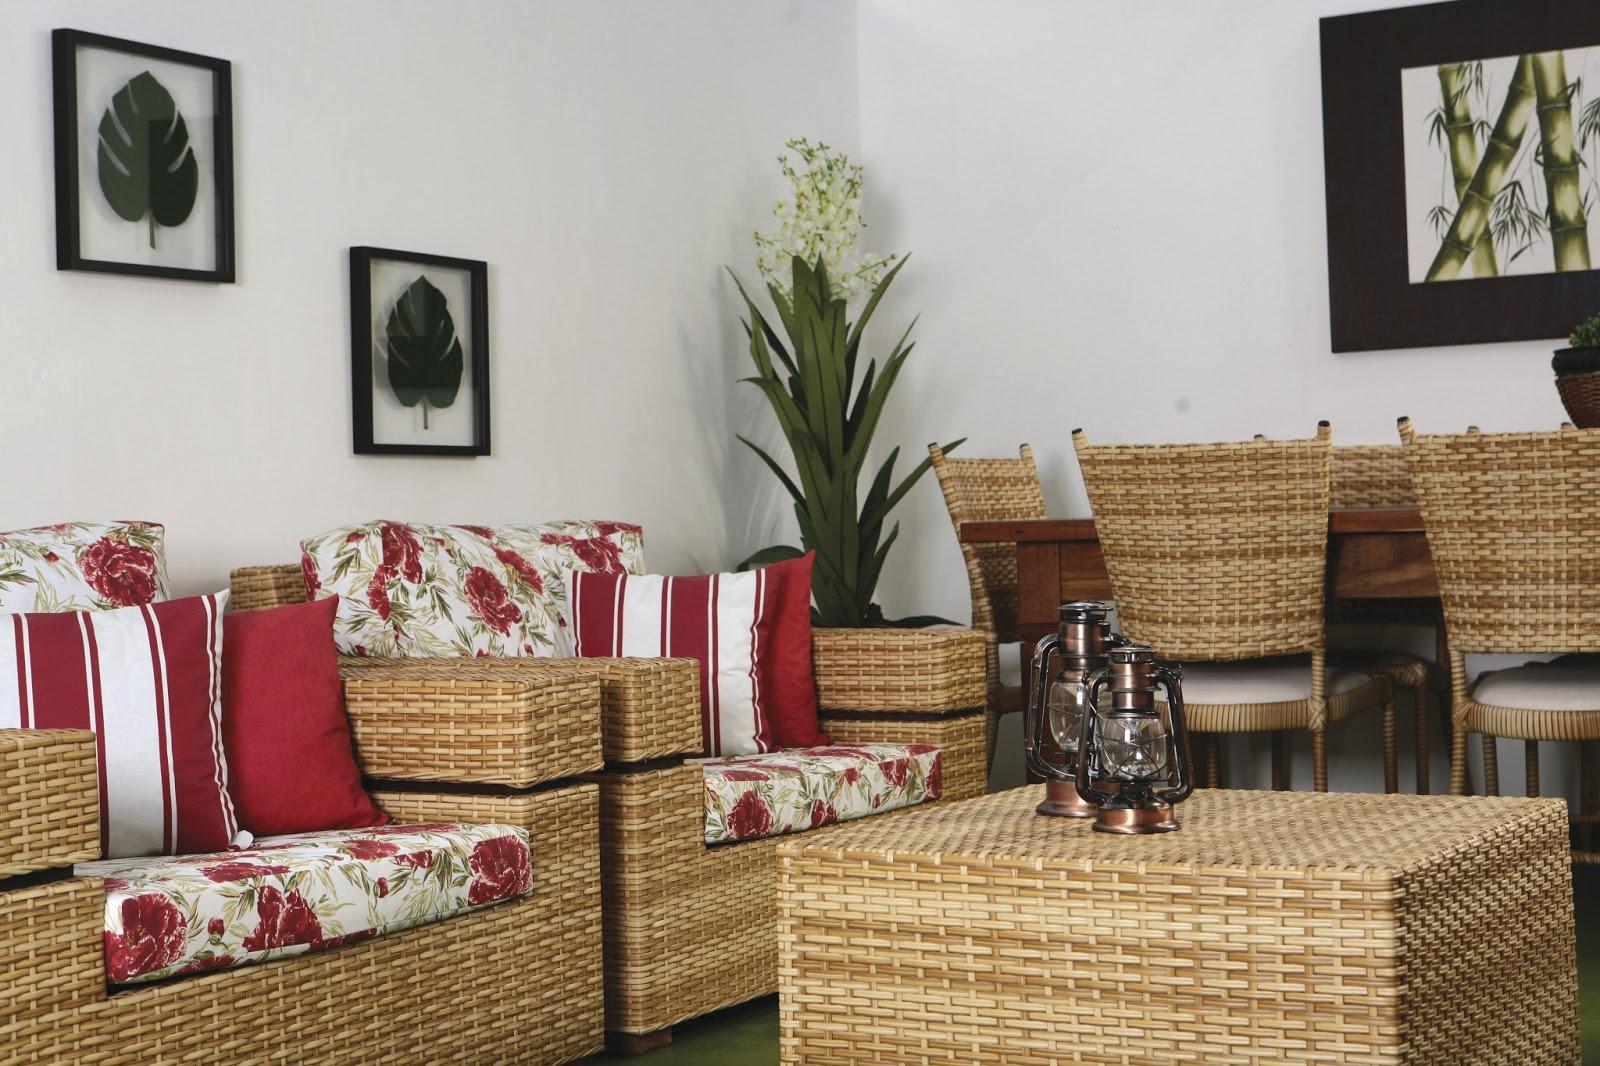 Poltronas mesa e cadeiras em fibra sintetica na cor bananeira. #74382F 1600x1066